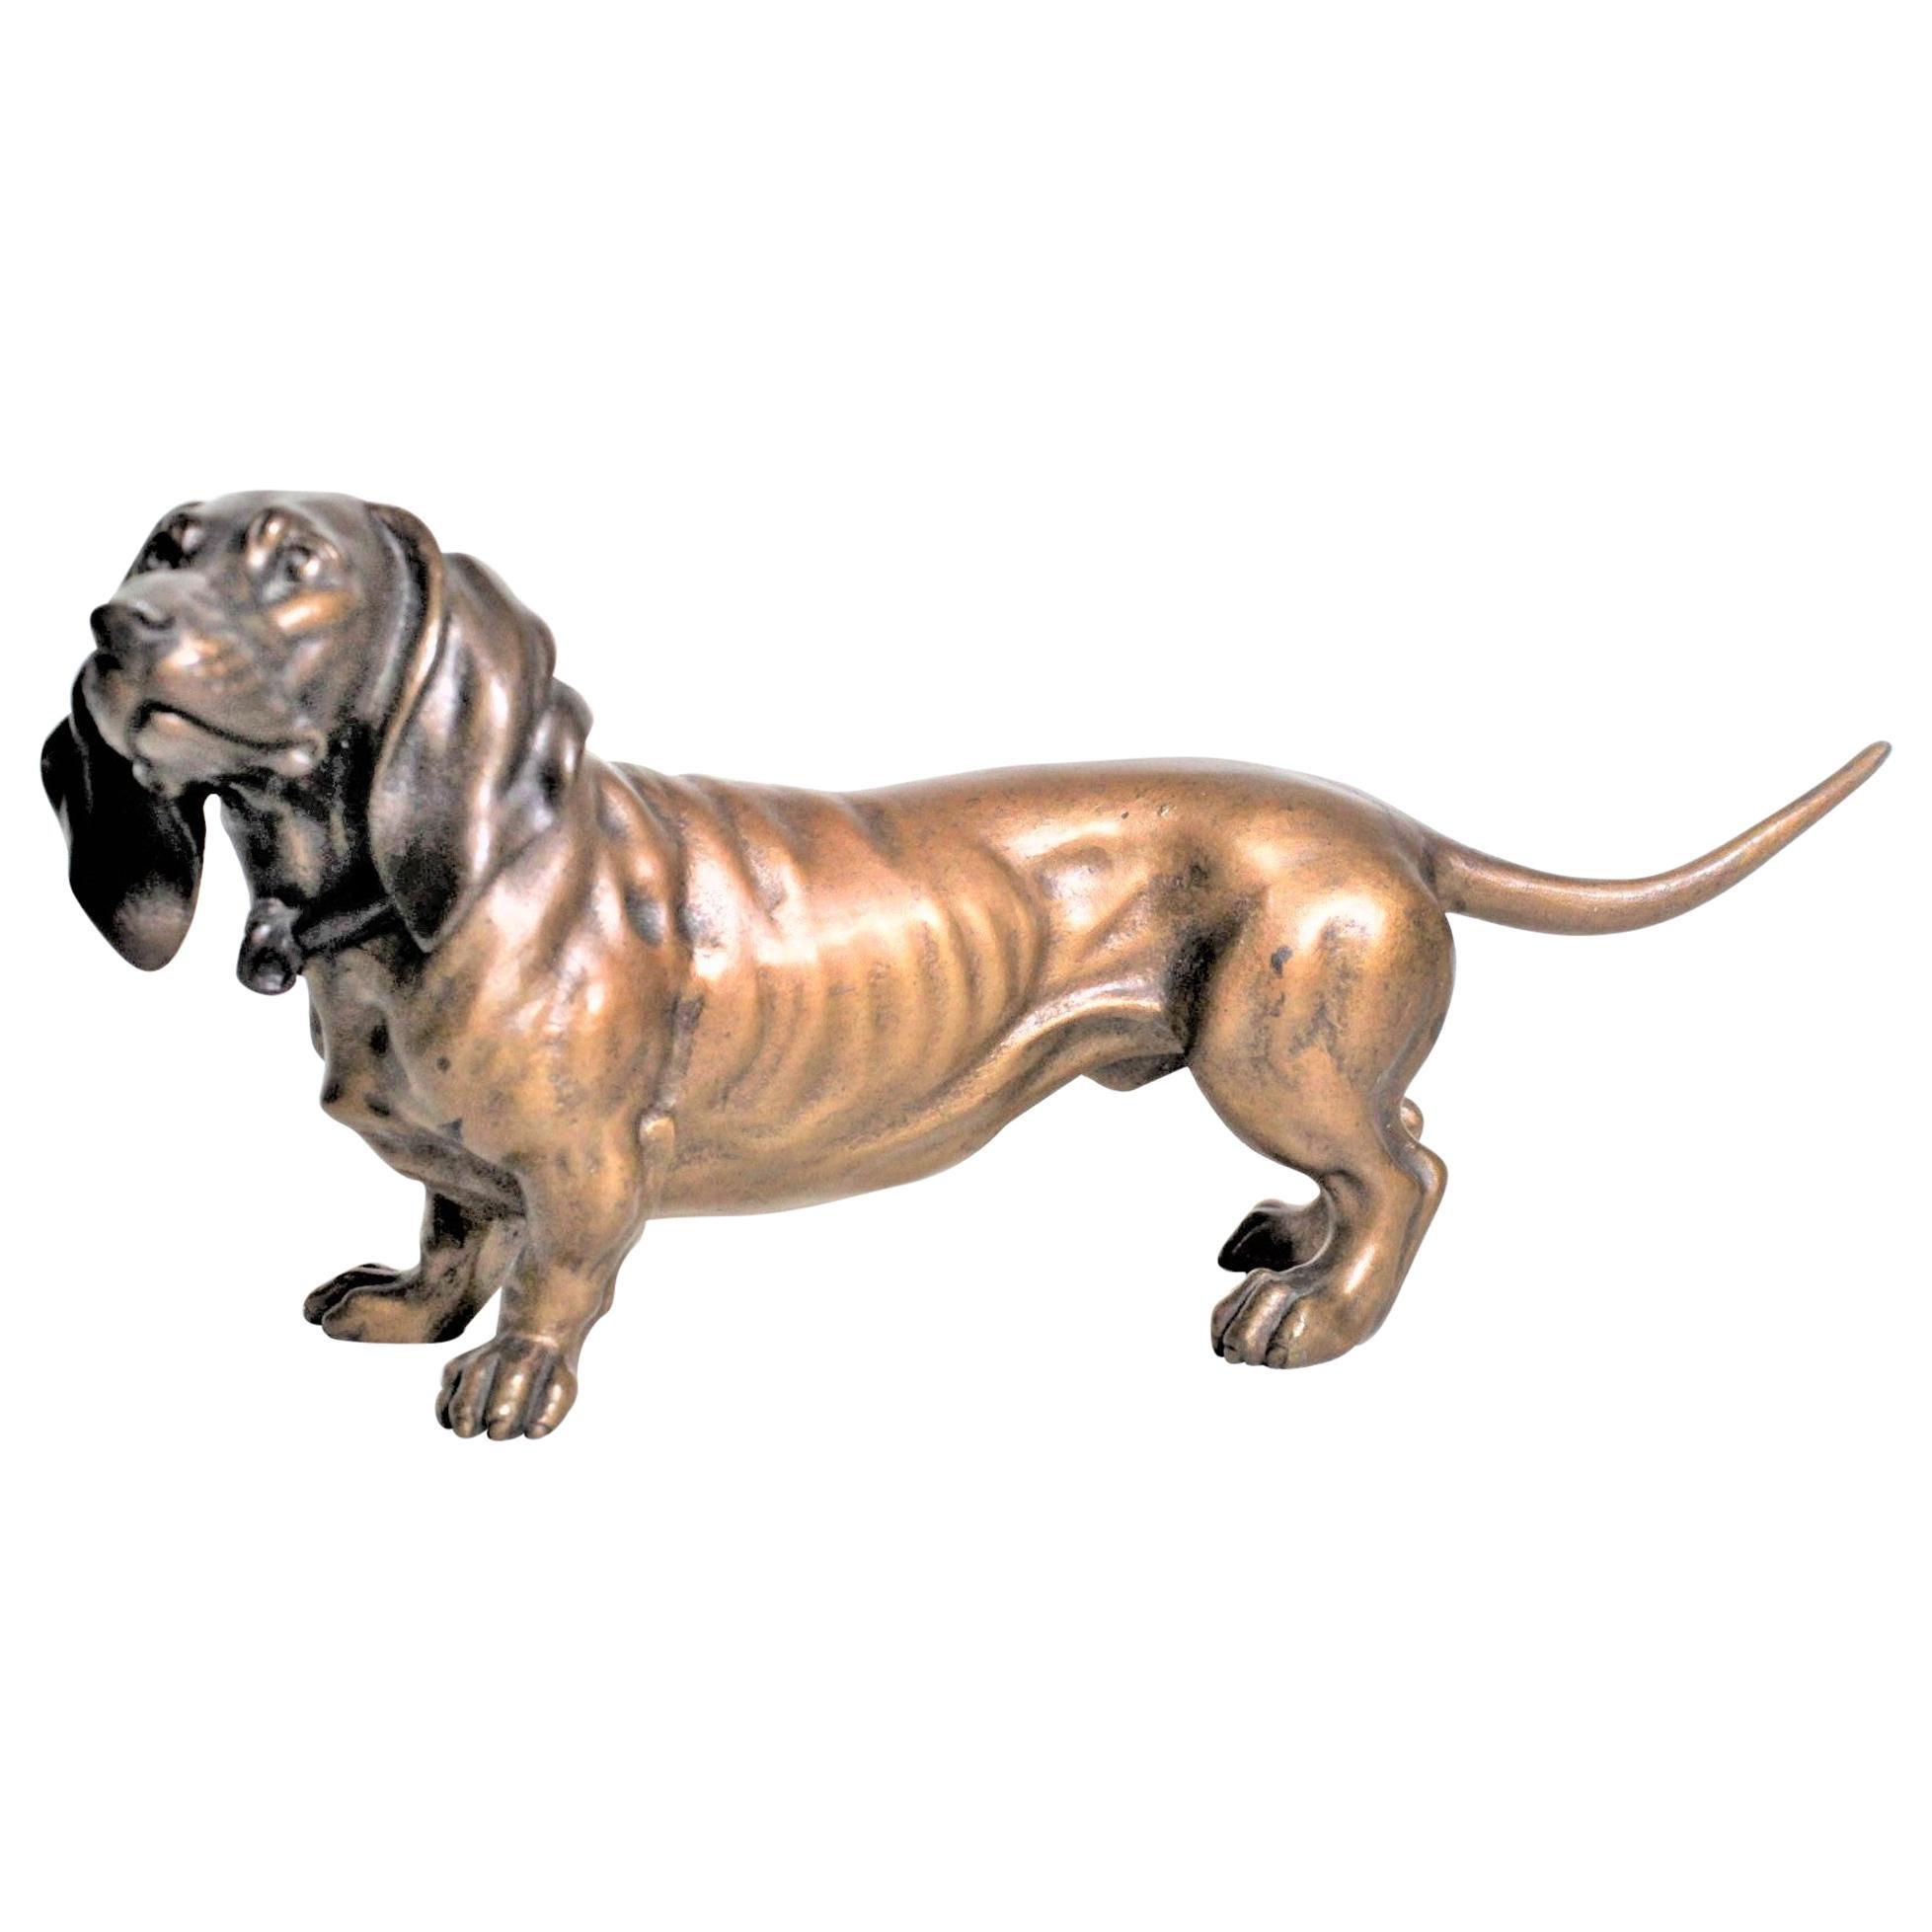 Large Antique Austrian Cold-Painted Bronze Basset Hound Dog Figurine